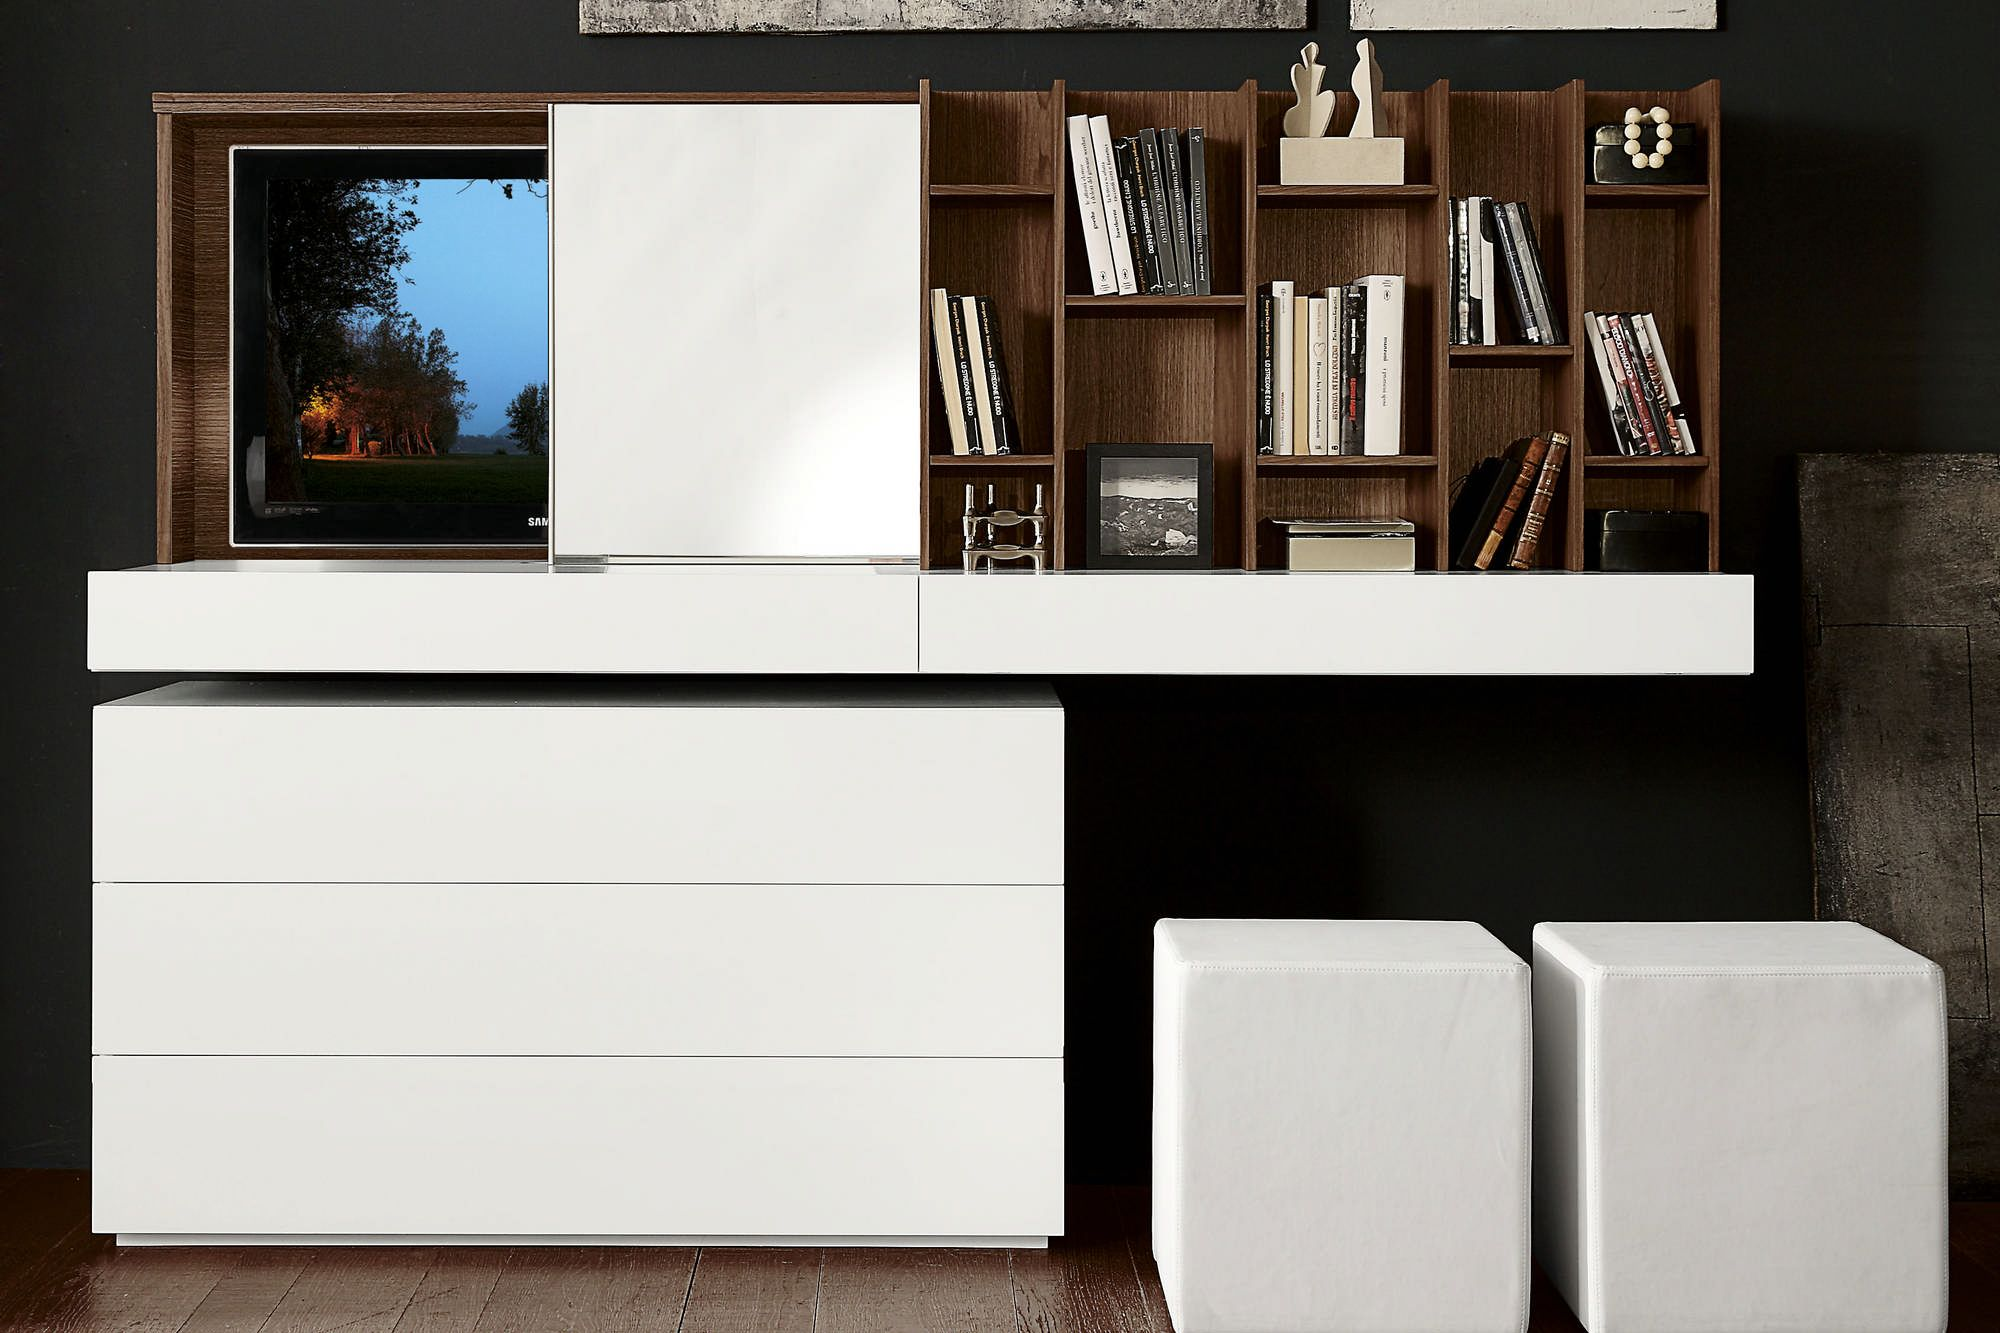 Complementi double ideas for interior design pinterest